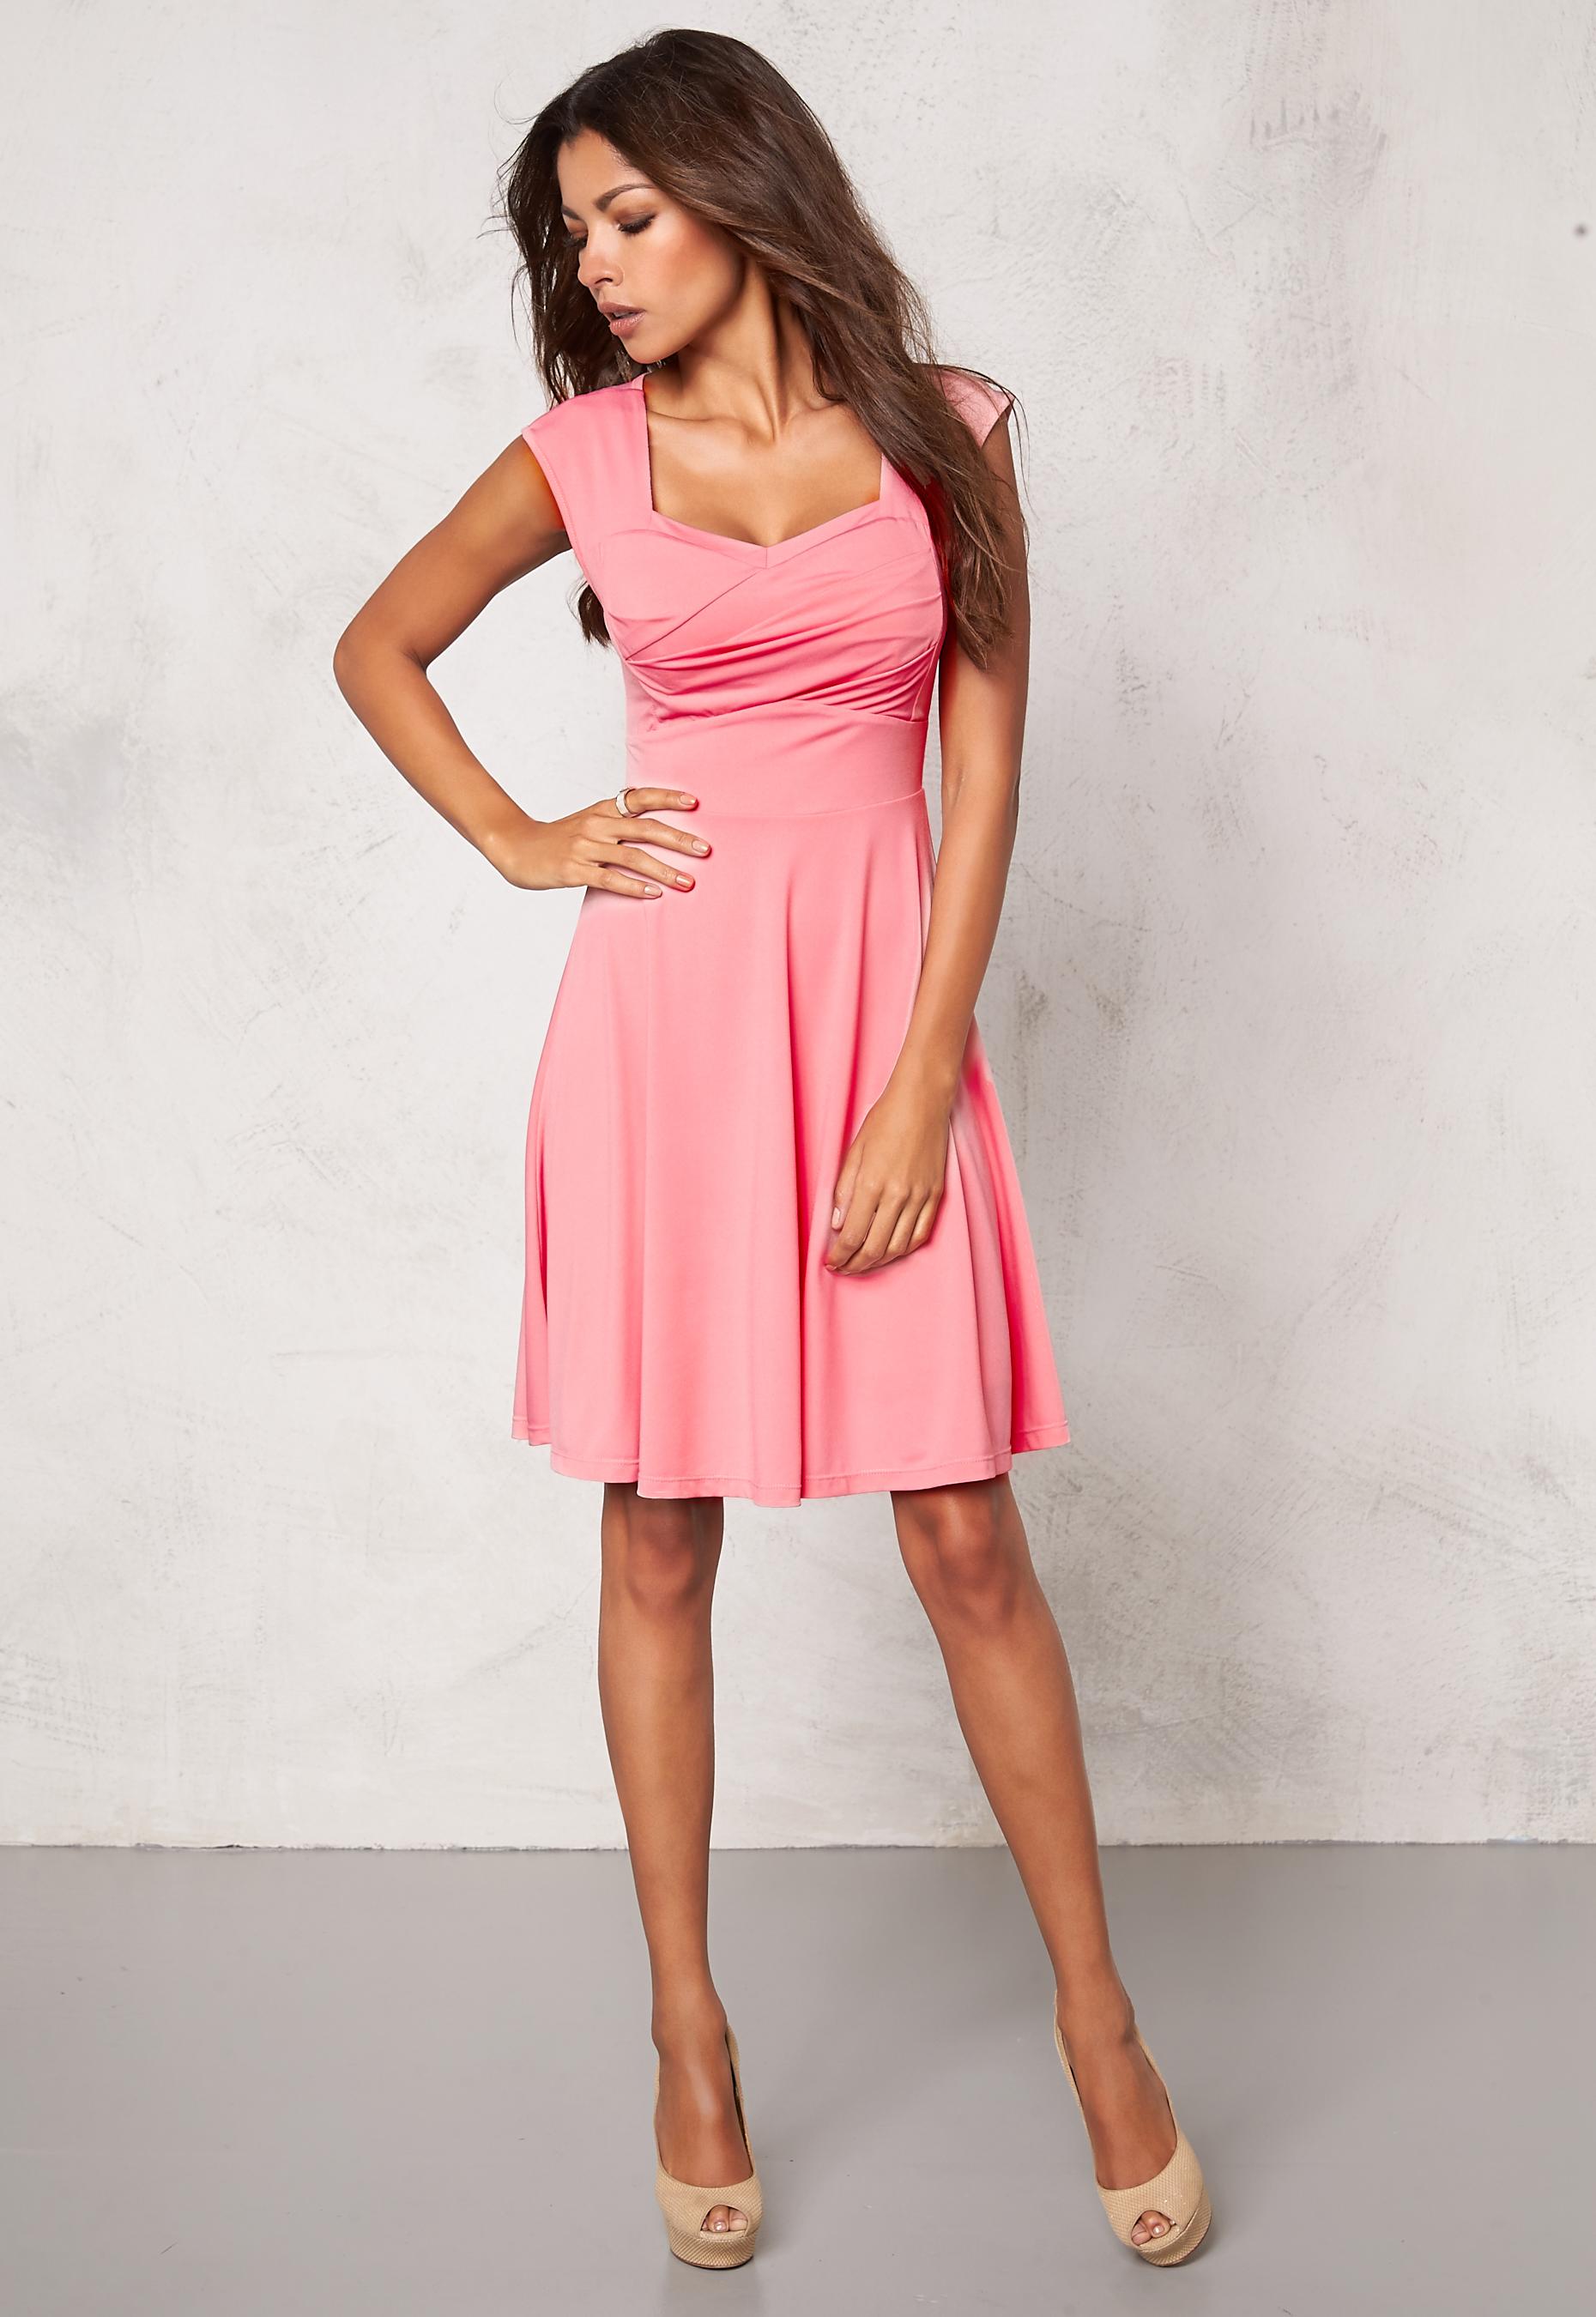 ab4bd4fabf25 Chiara Forthi Suelly Dress Light pink - Bubbleroom